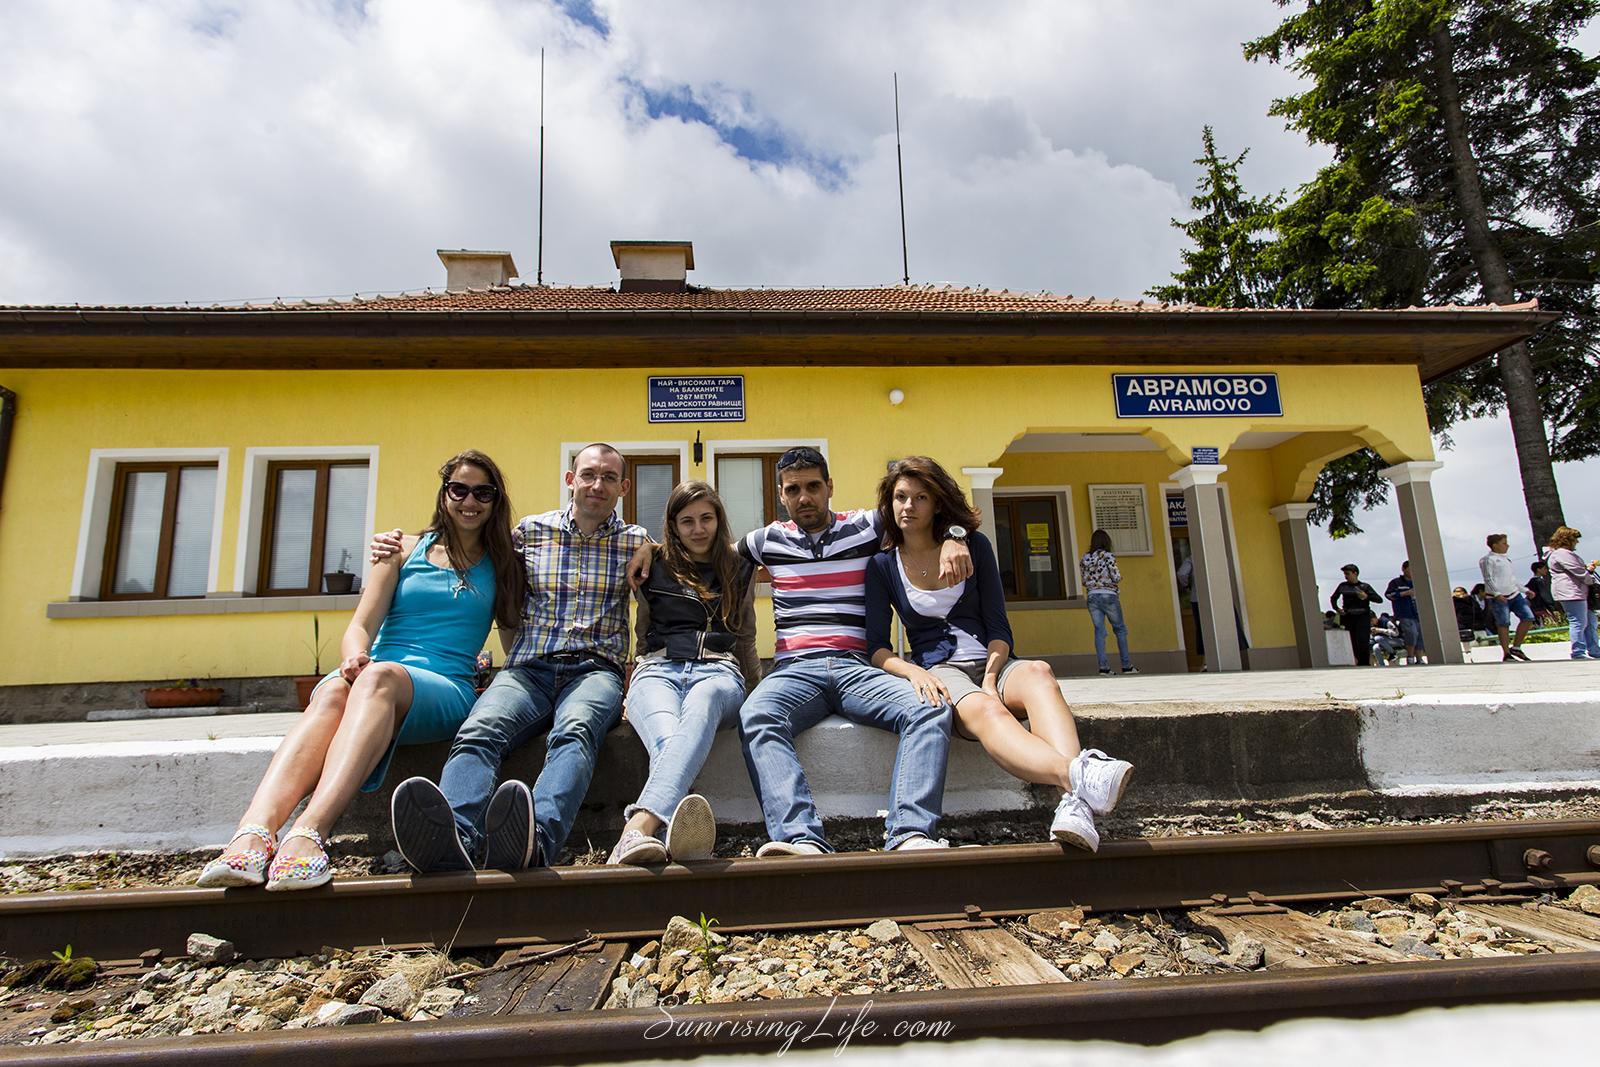 Avramovo station